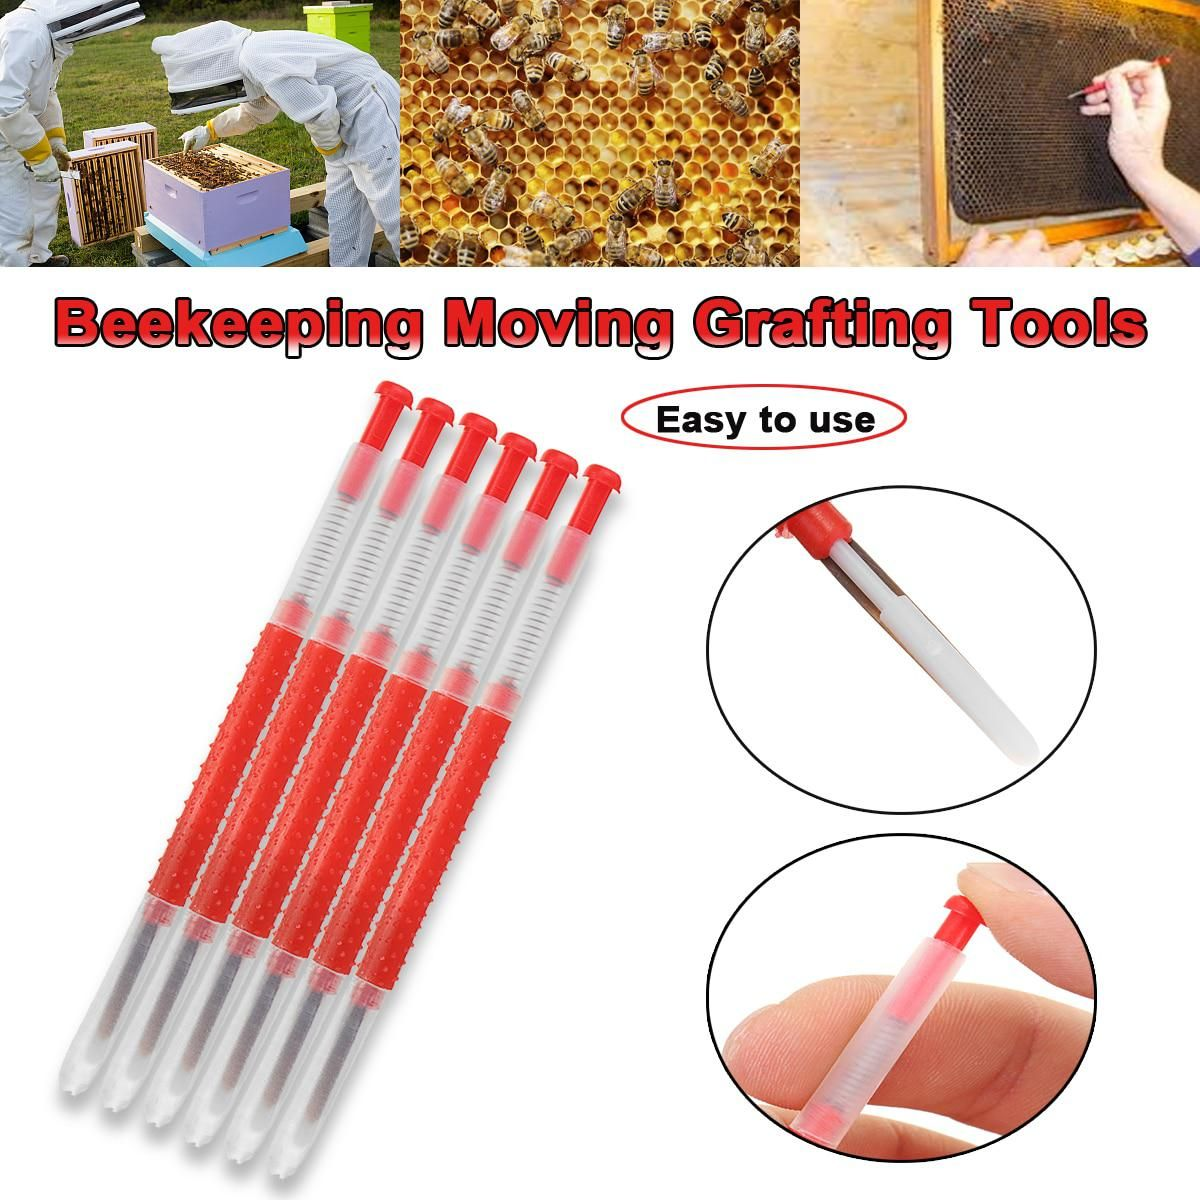 5pcs Beekeepers Tools for Beekeepers Grafting Tools Rearing Bee keeping